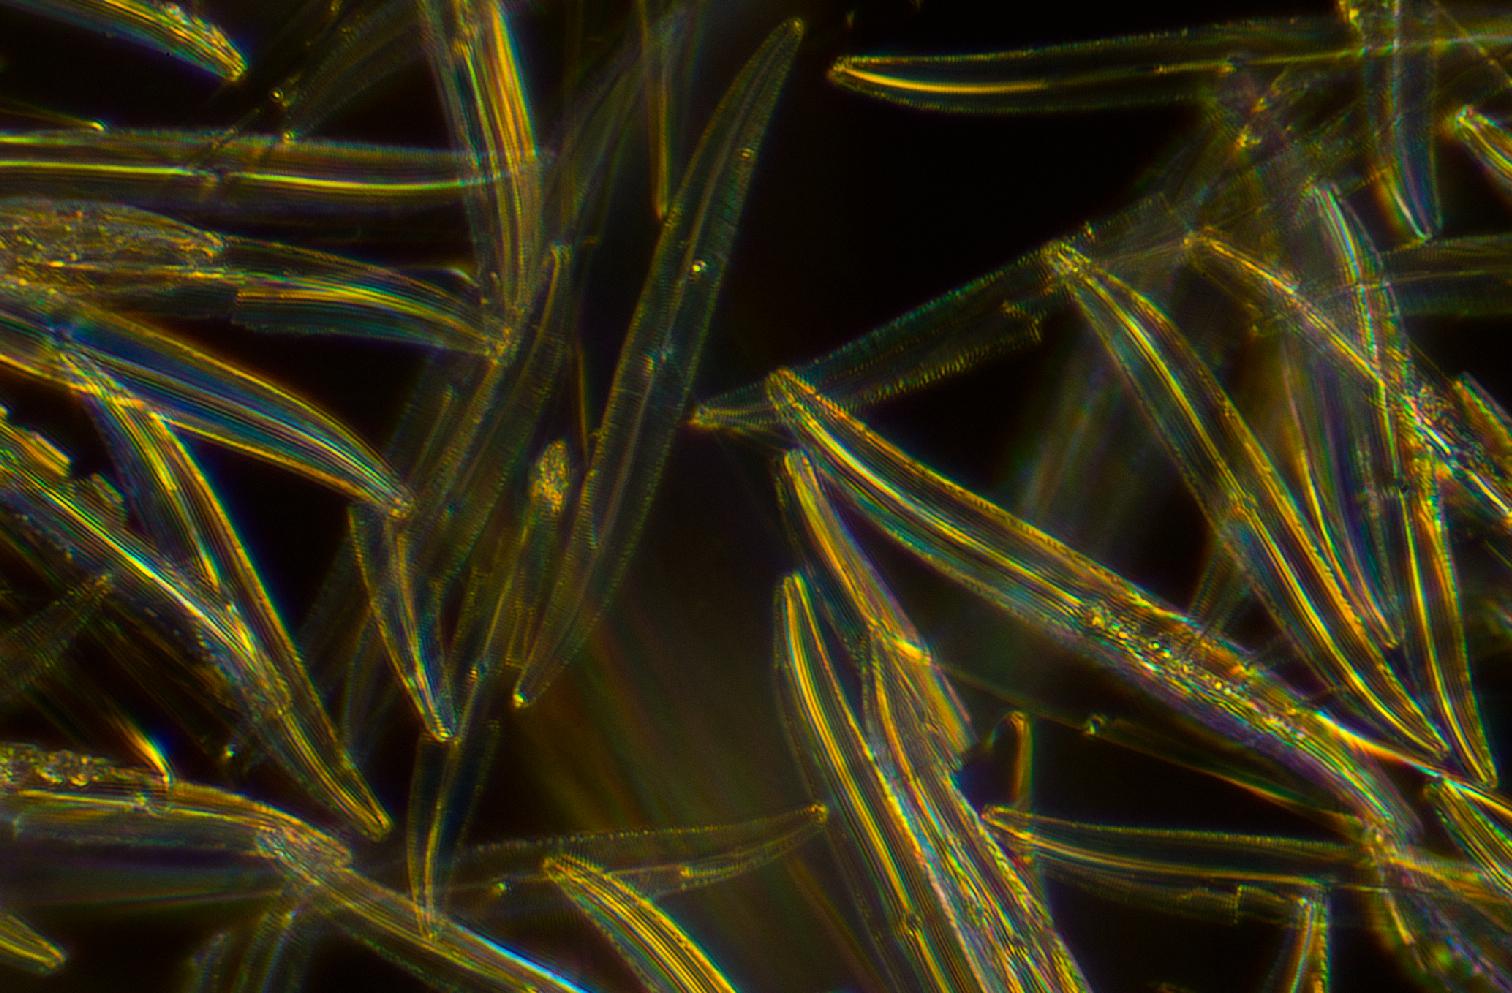 Antique Microscopes diatoms 1.jpg